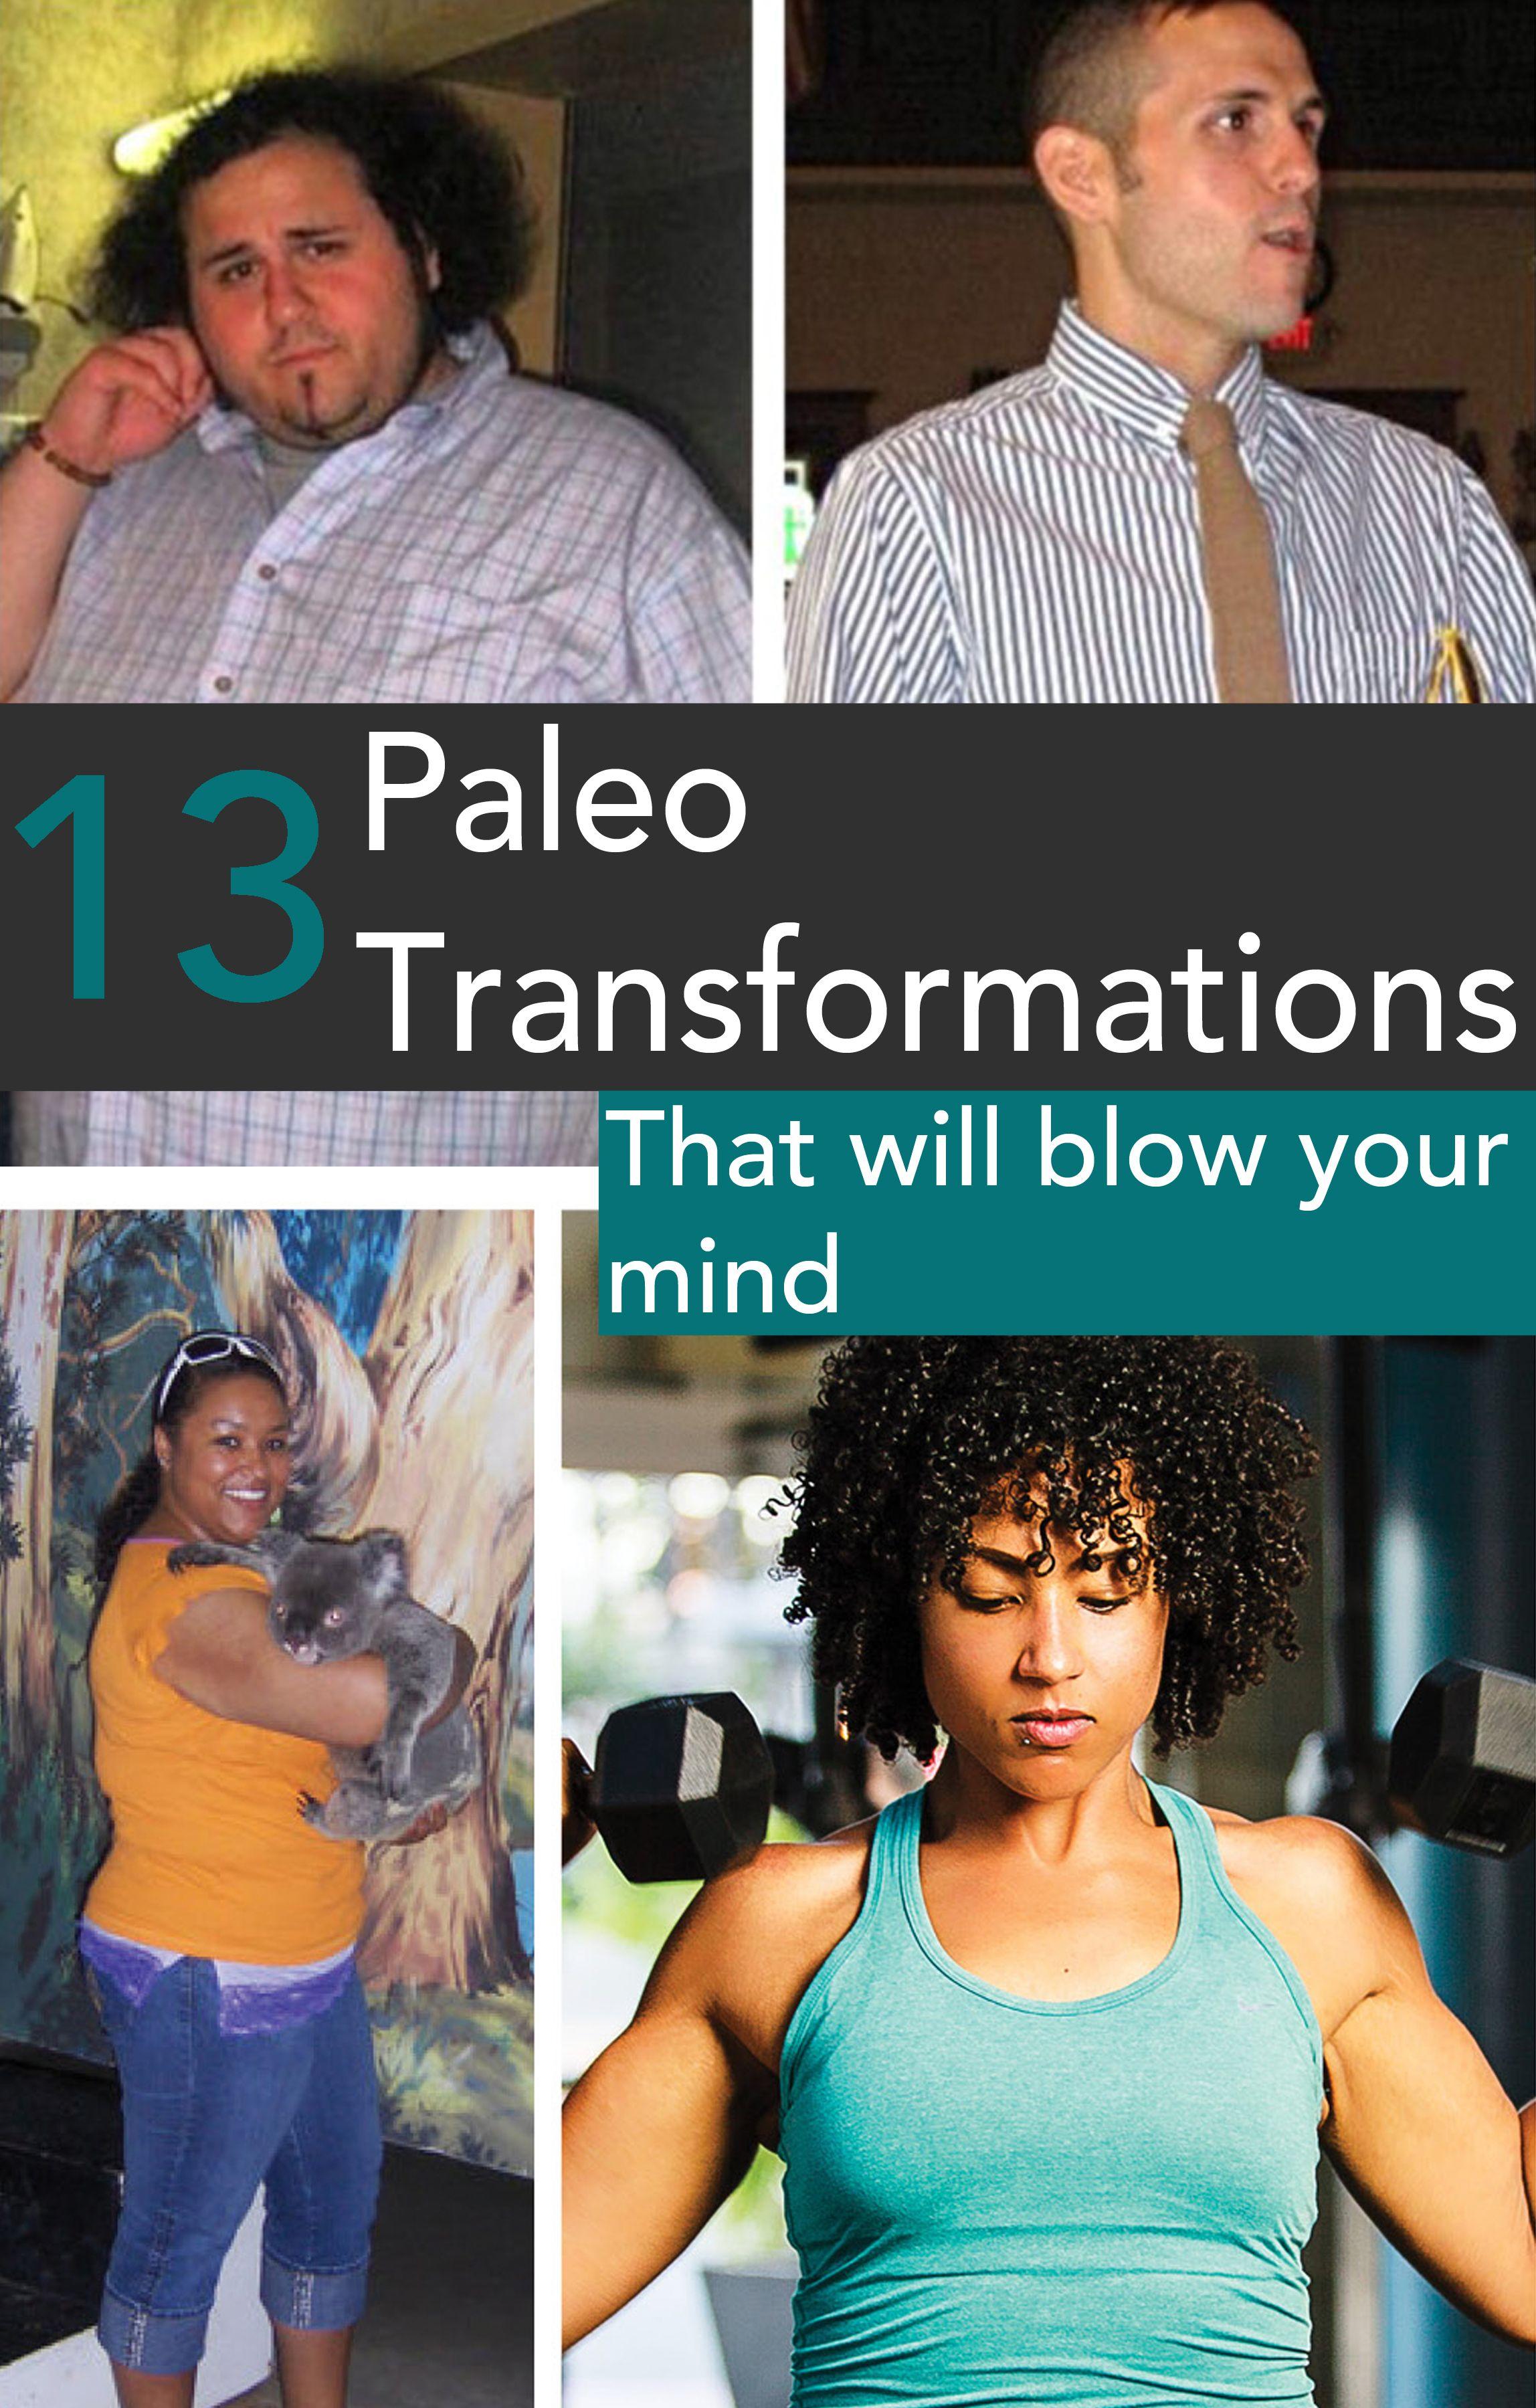 13 Paleo Success Stories that will blow your mind | Paleo | Pinterest | Vida saludable, Recetas ...